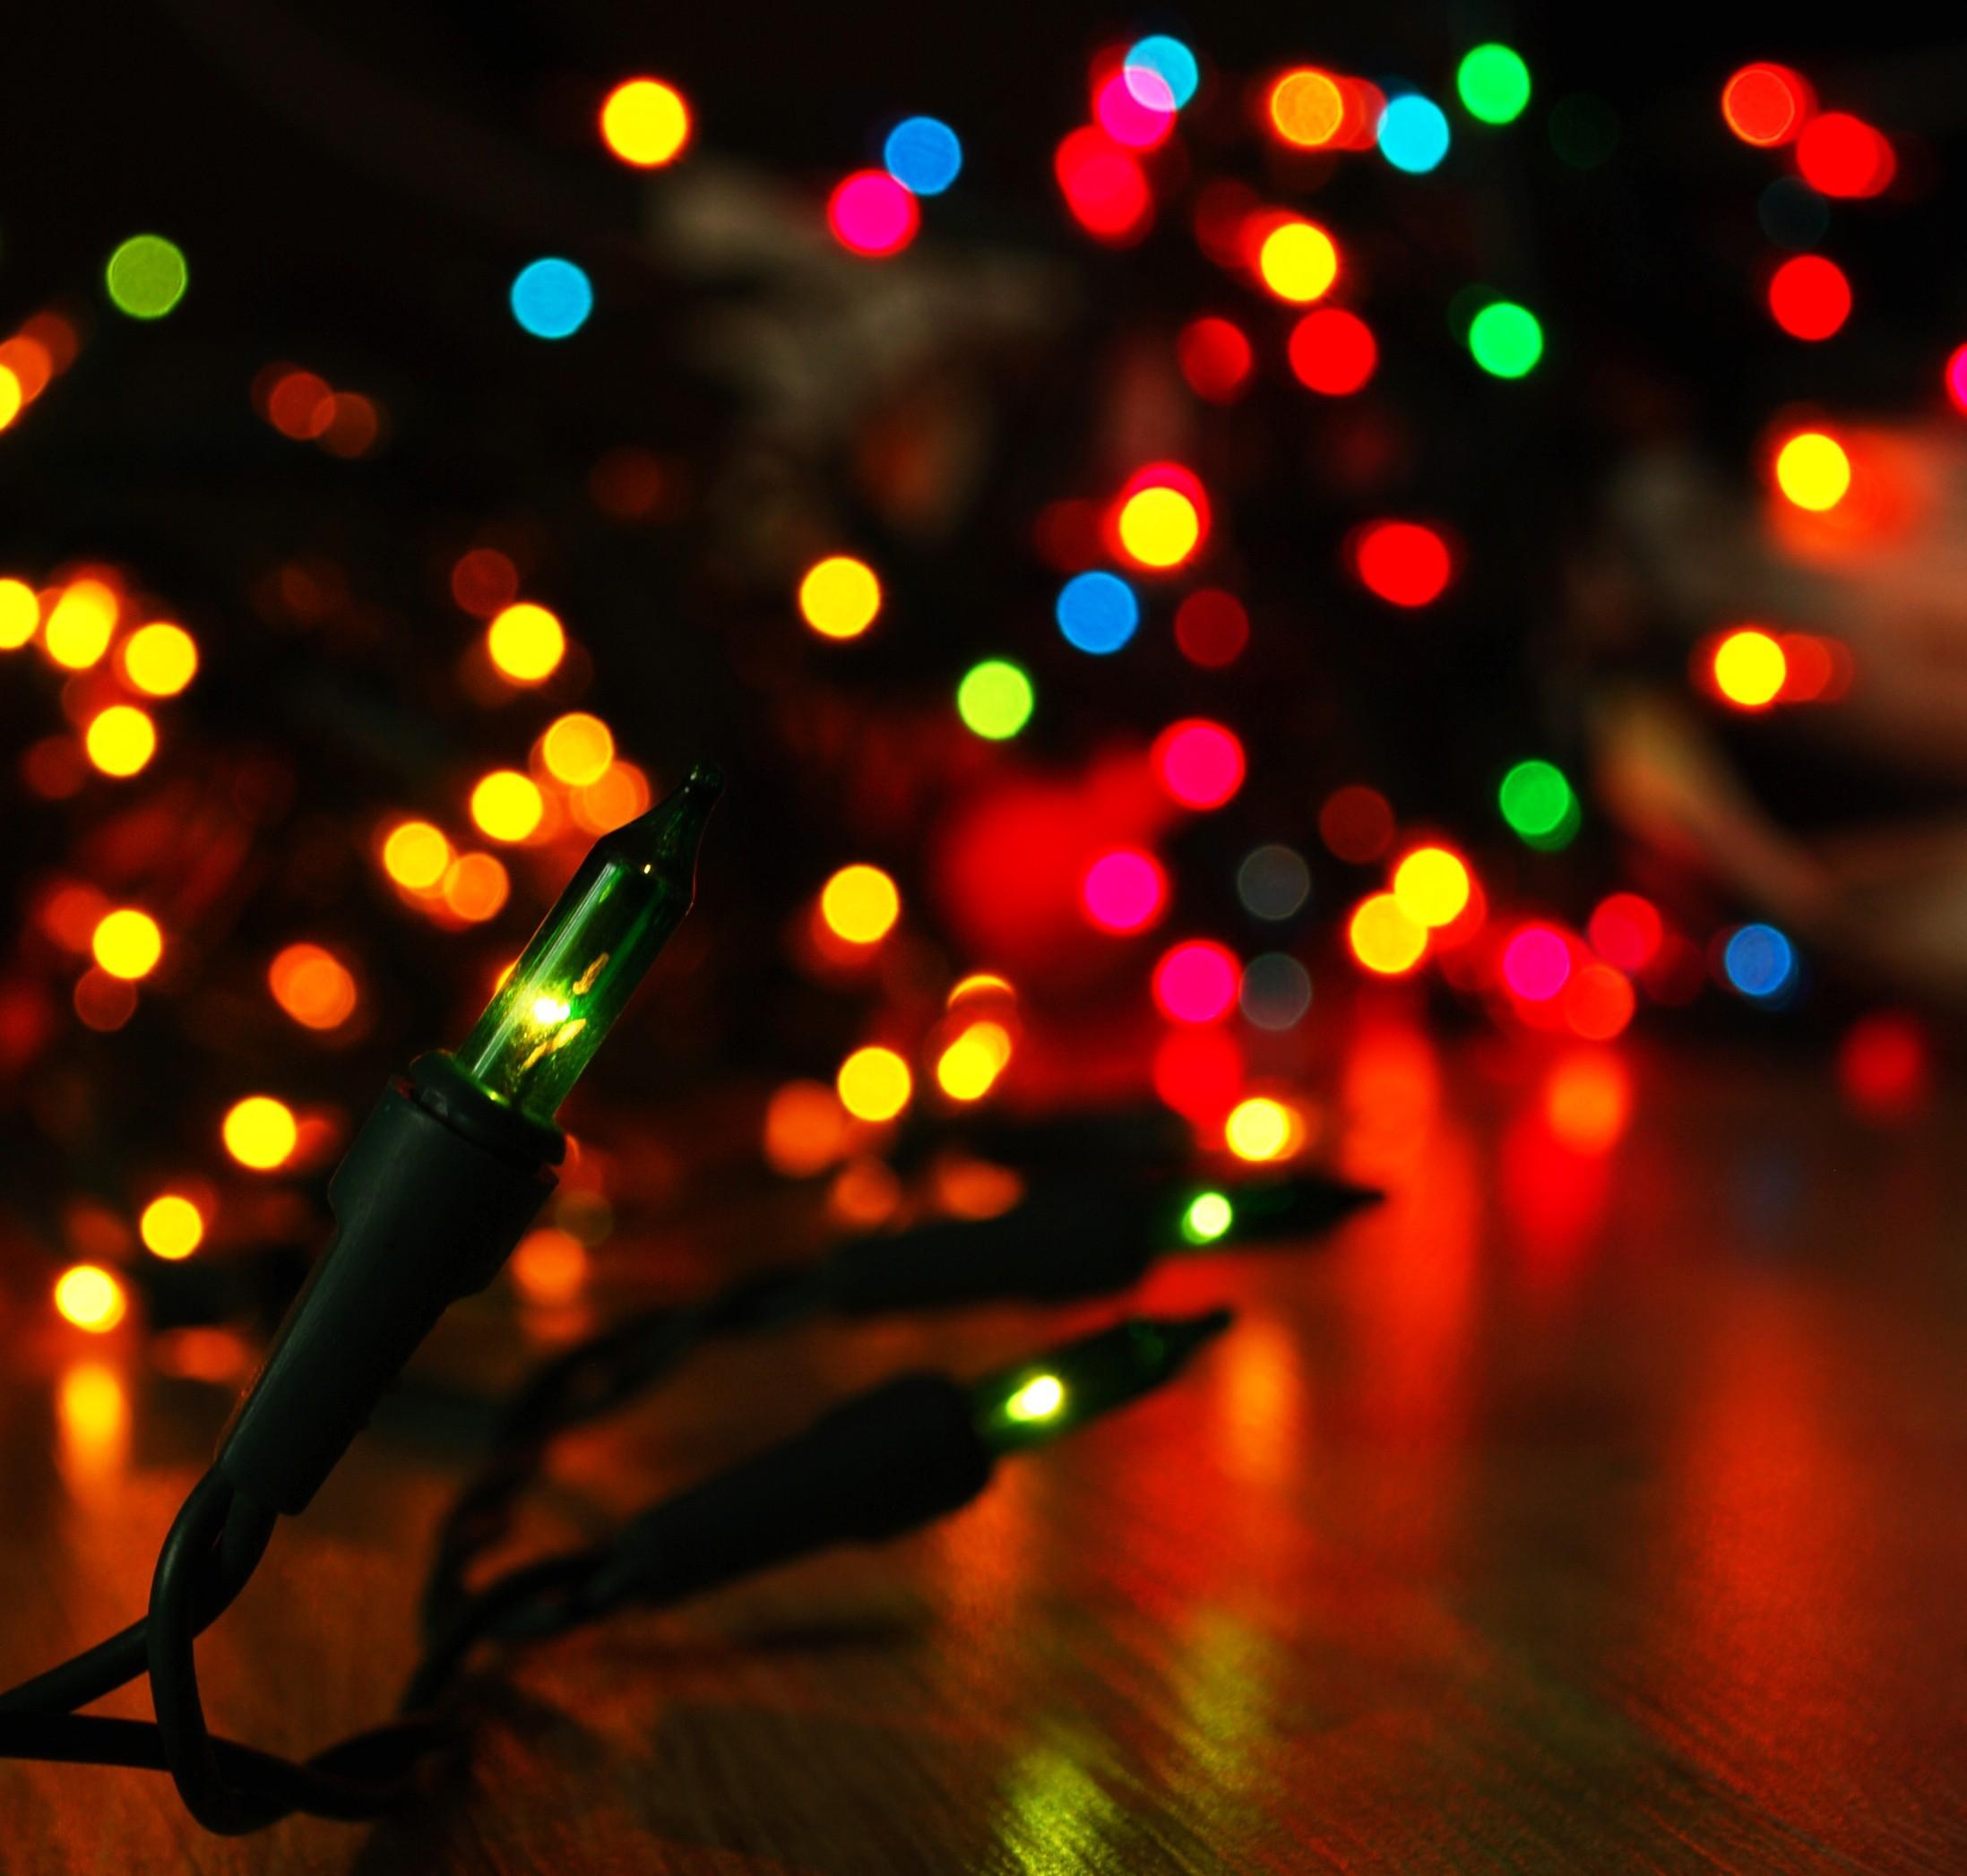 Christmas Lights Desktop Hd Wallpapers Background Tumblr